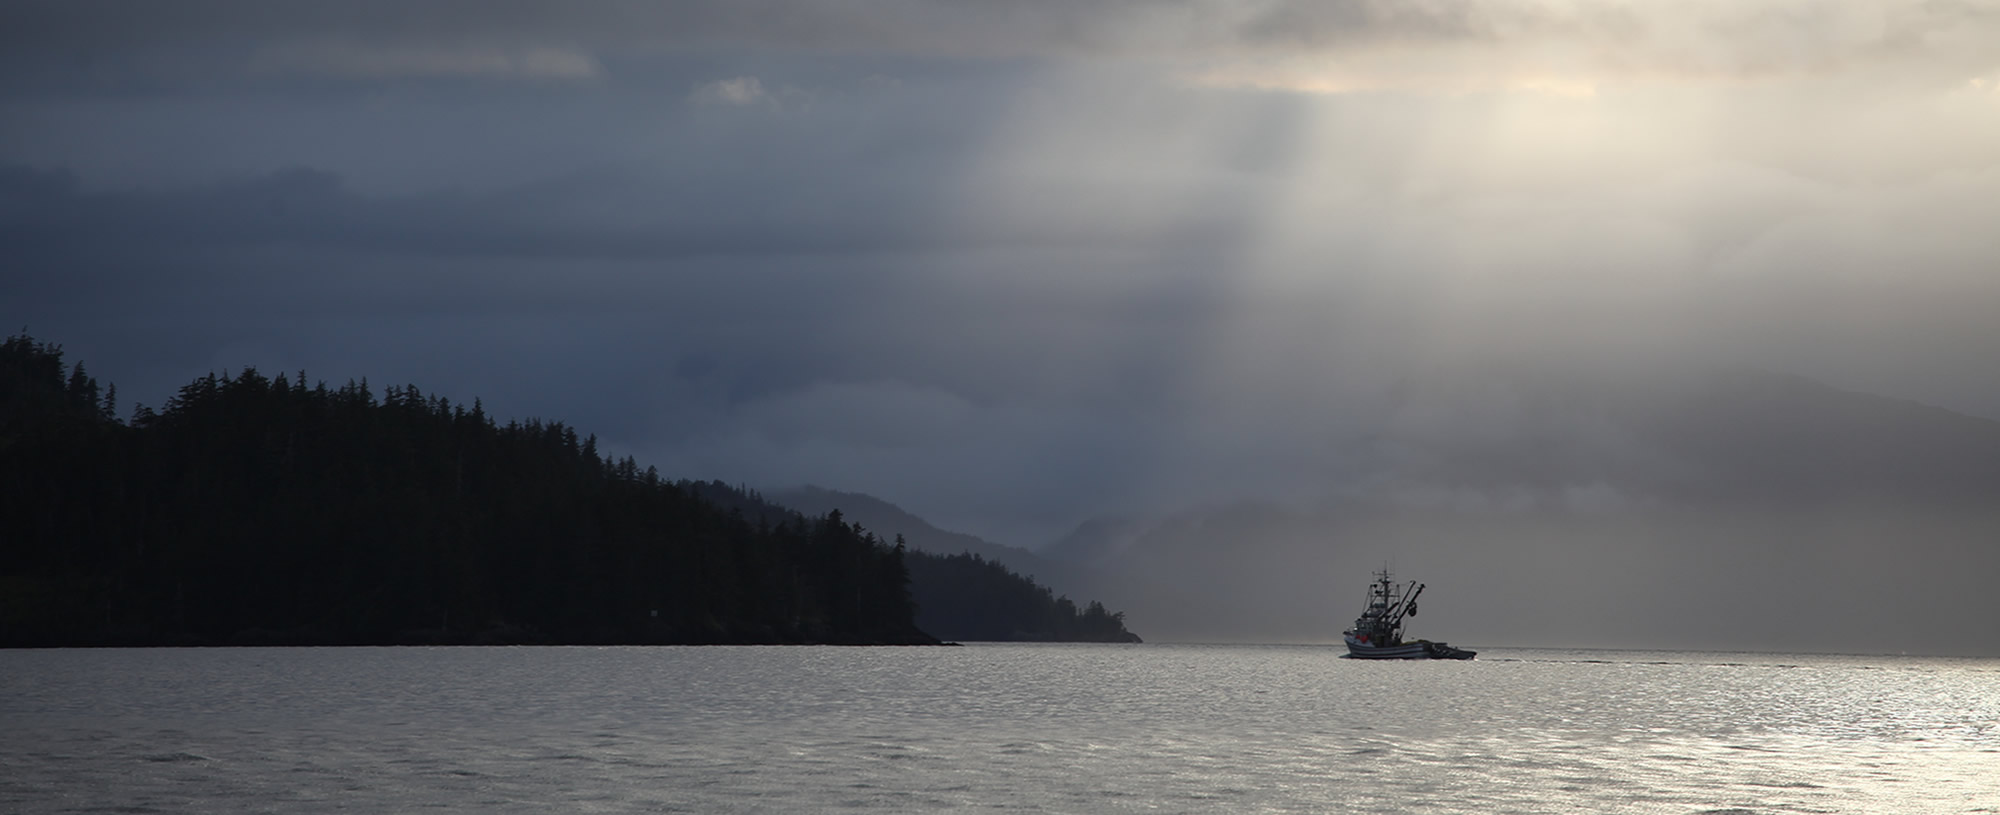 alaska-whittier-fjord